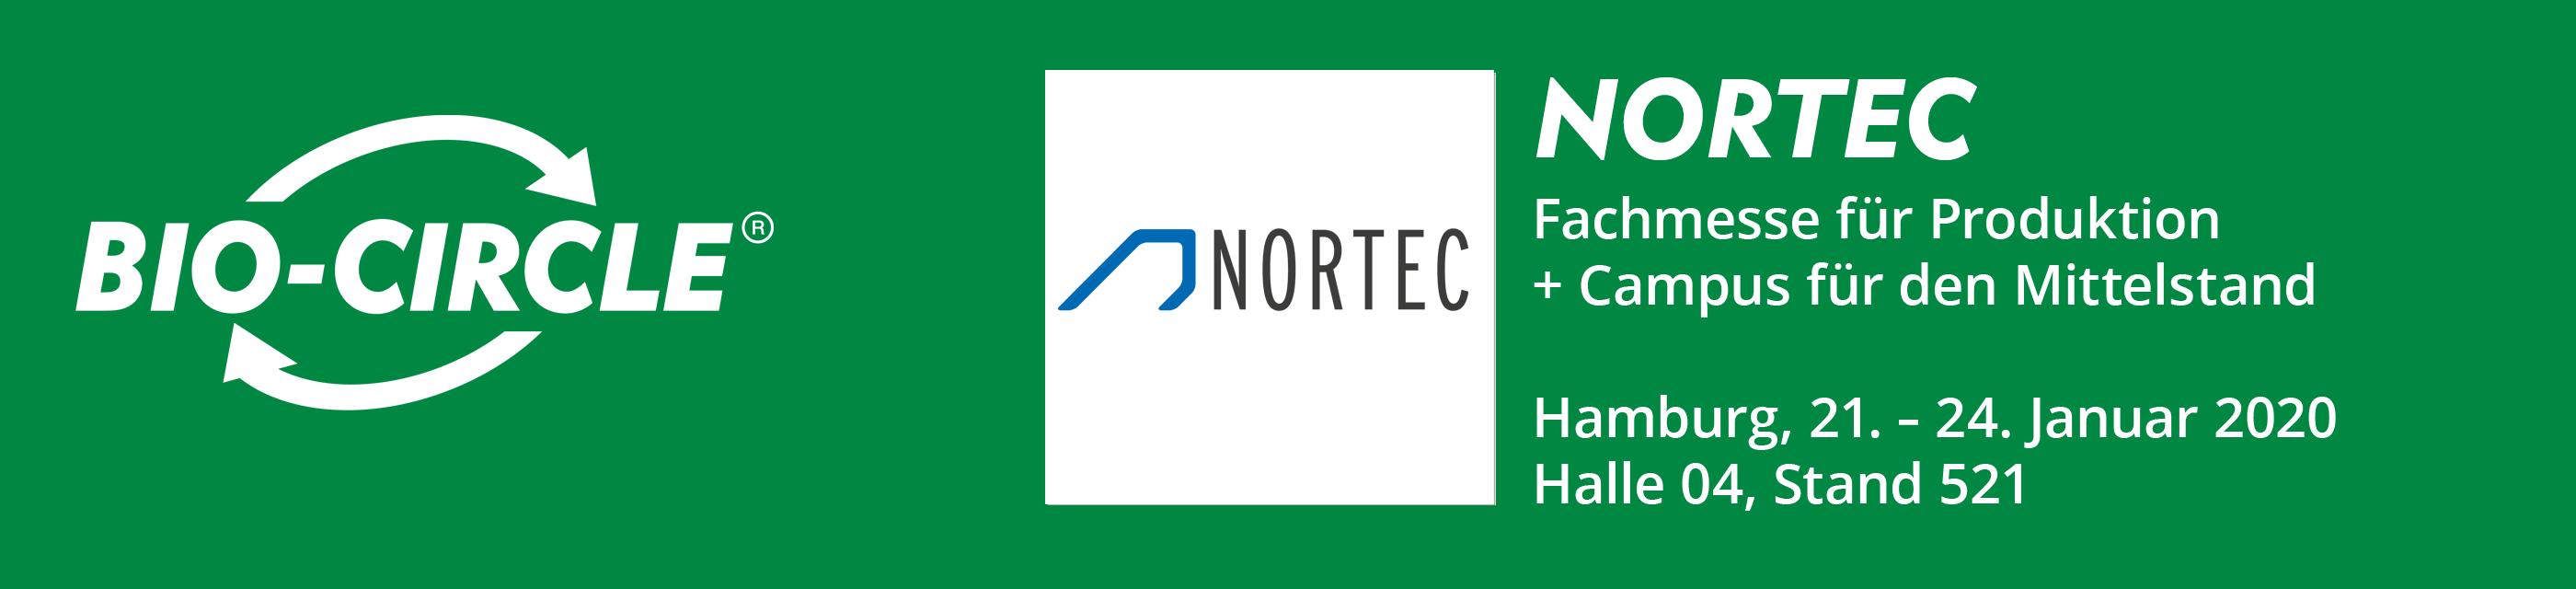 Messe_Info_Banner_NORTEC-Hamburg_2020